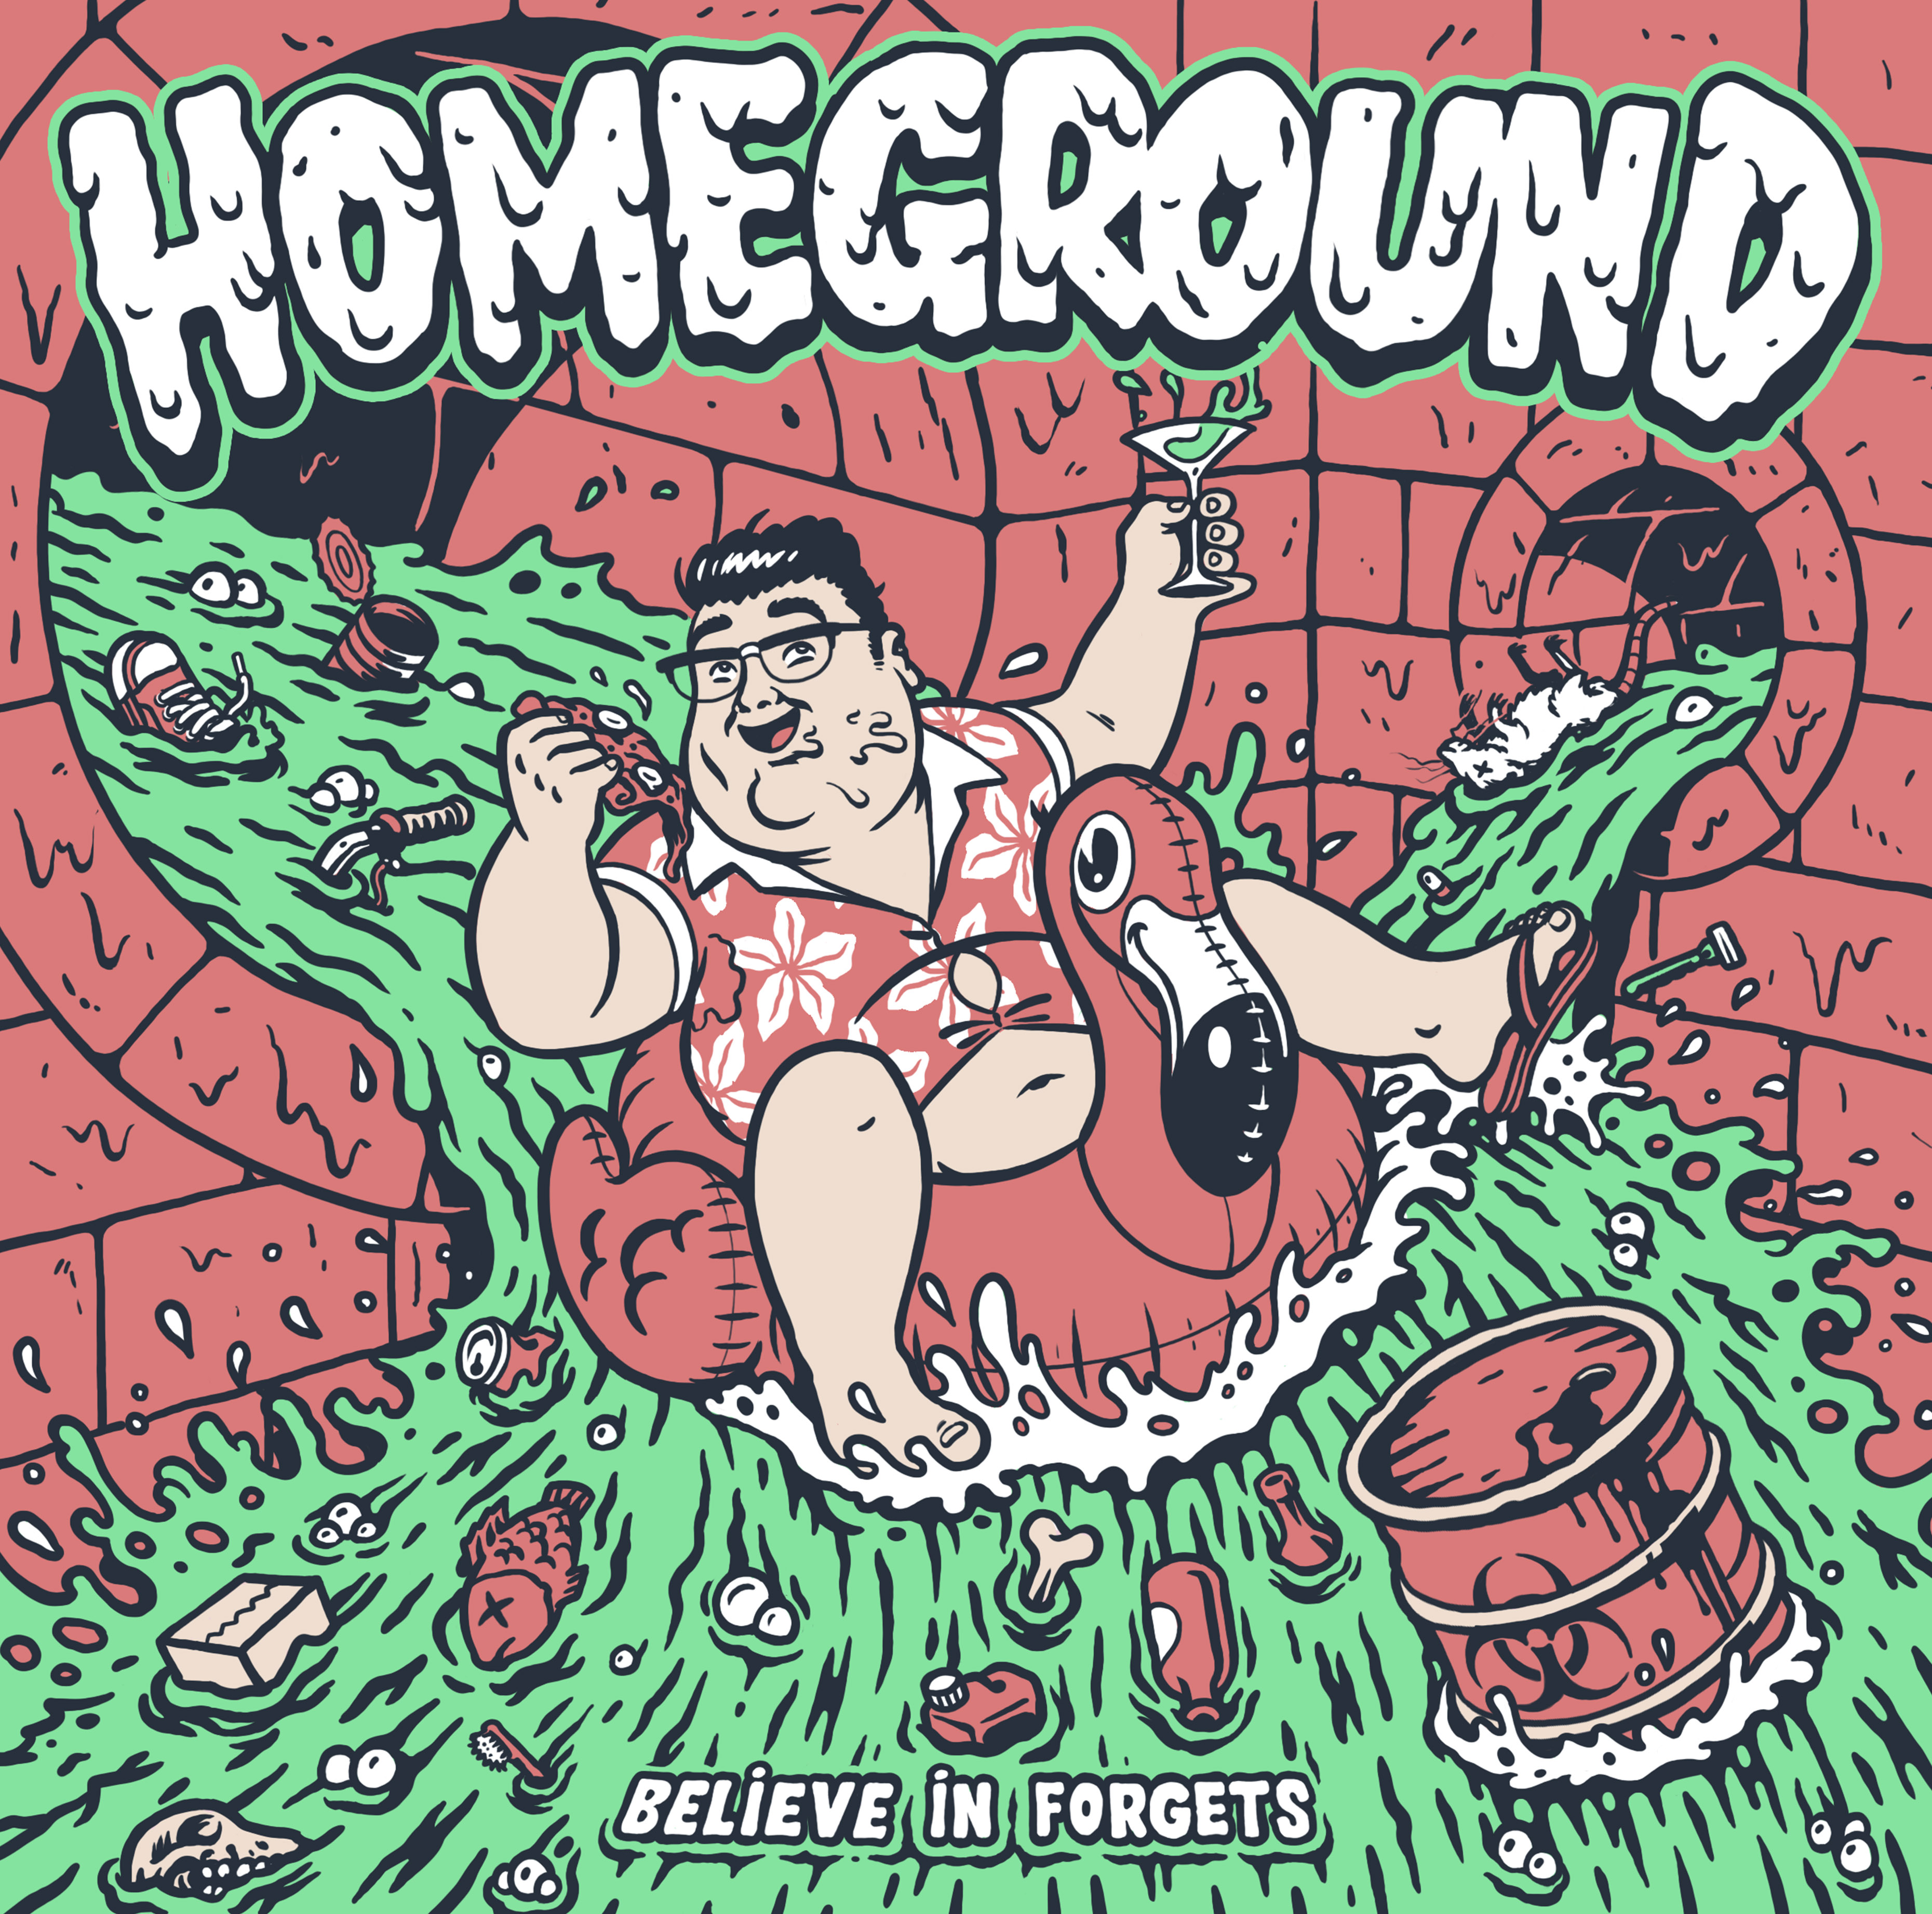 Homeground - Believe in Forgets [Vinyl, LP]